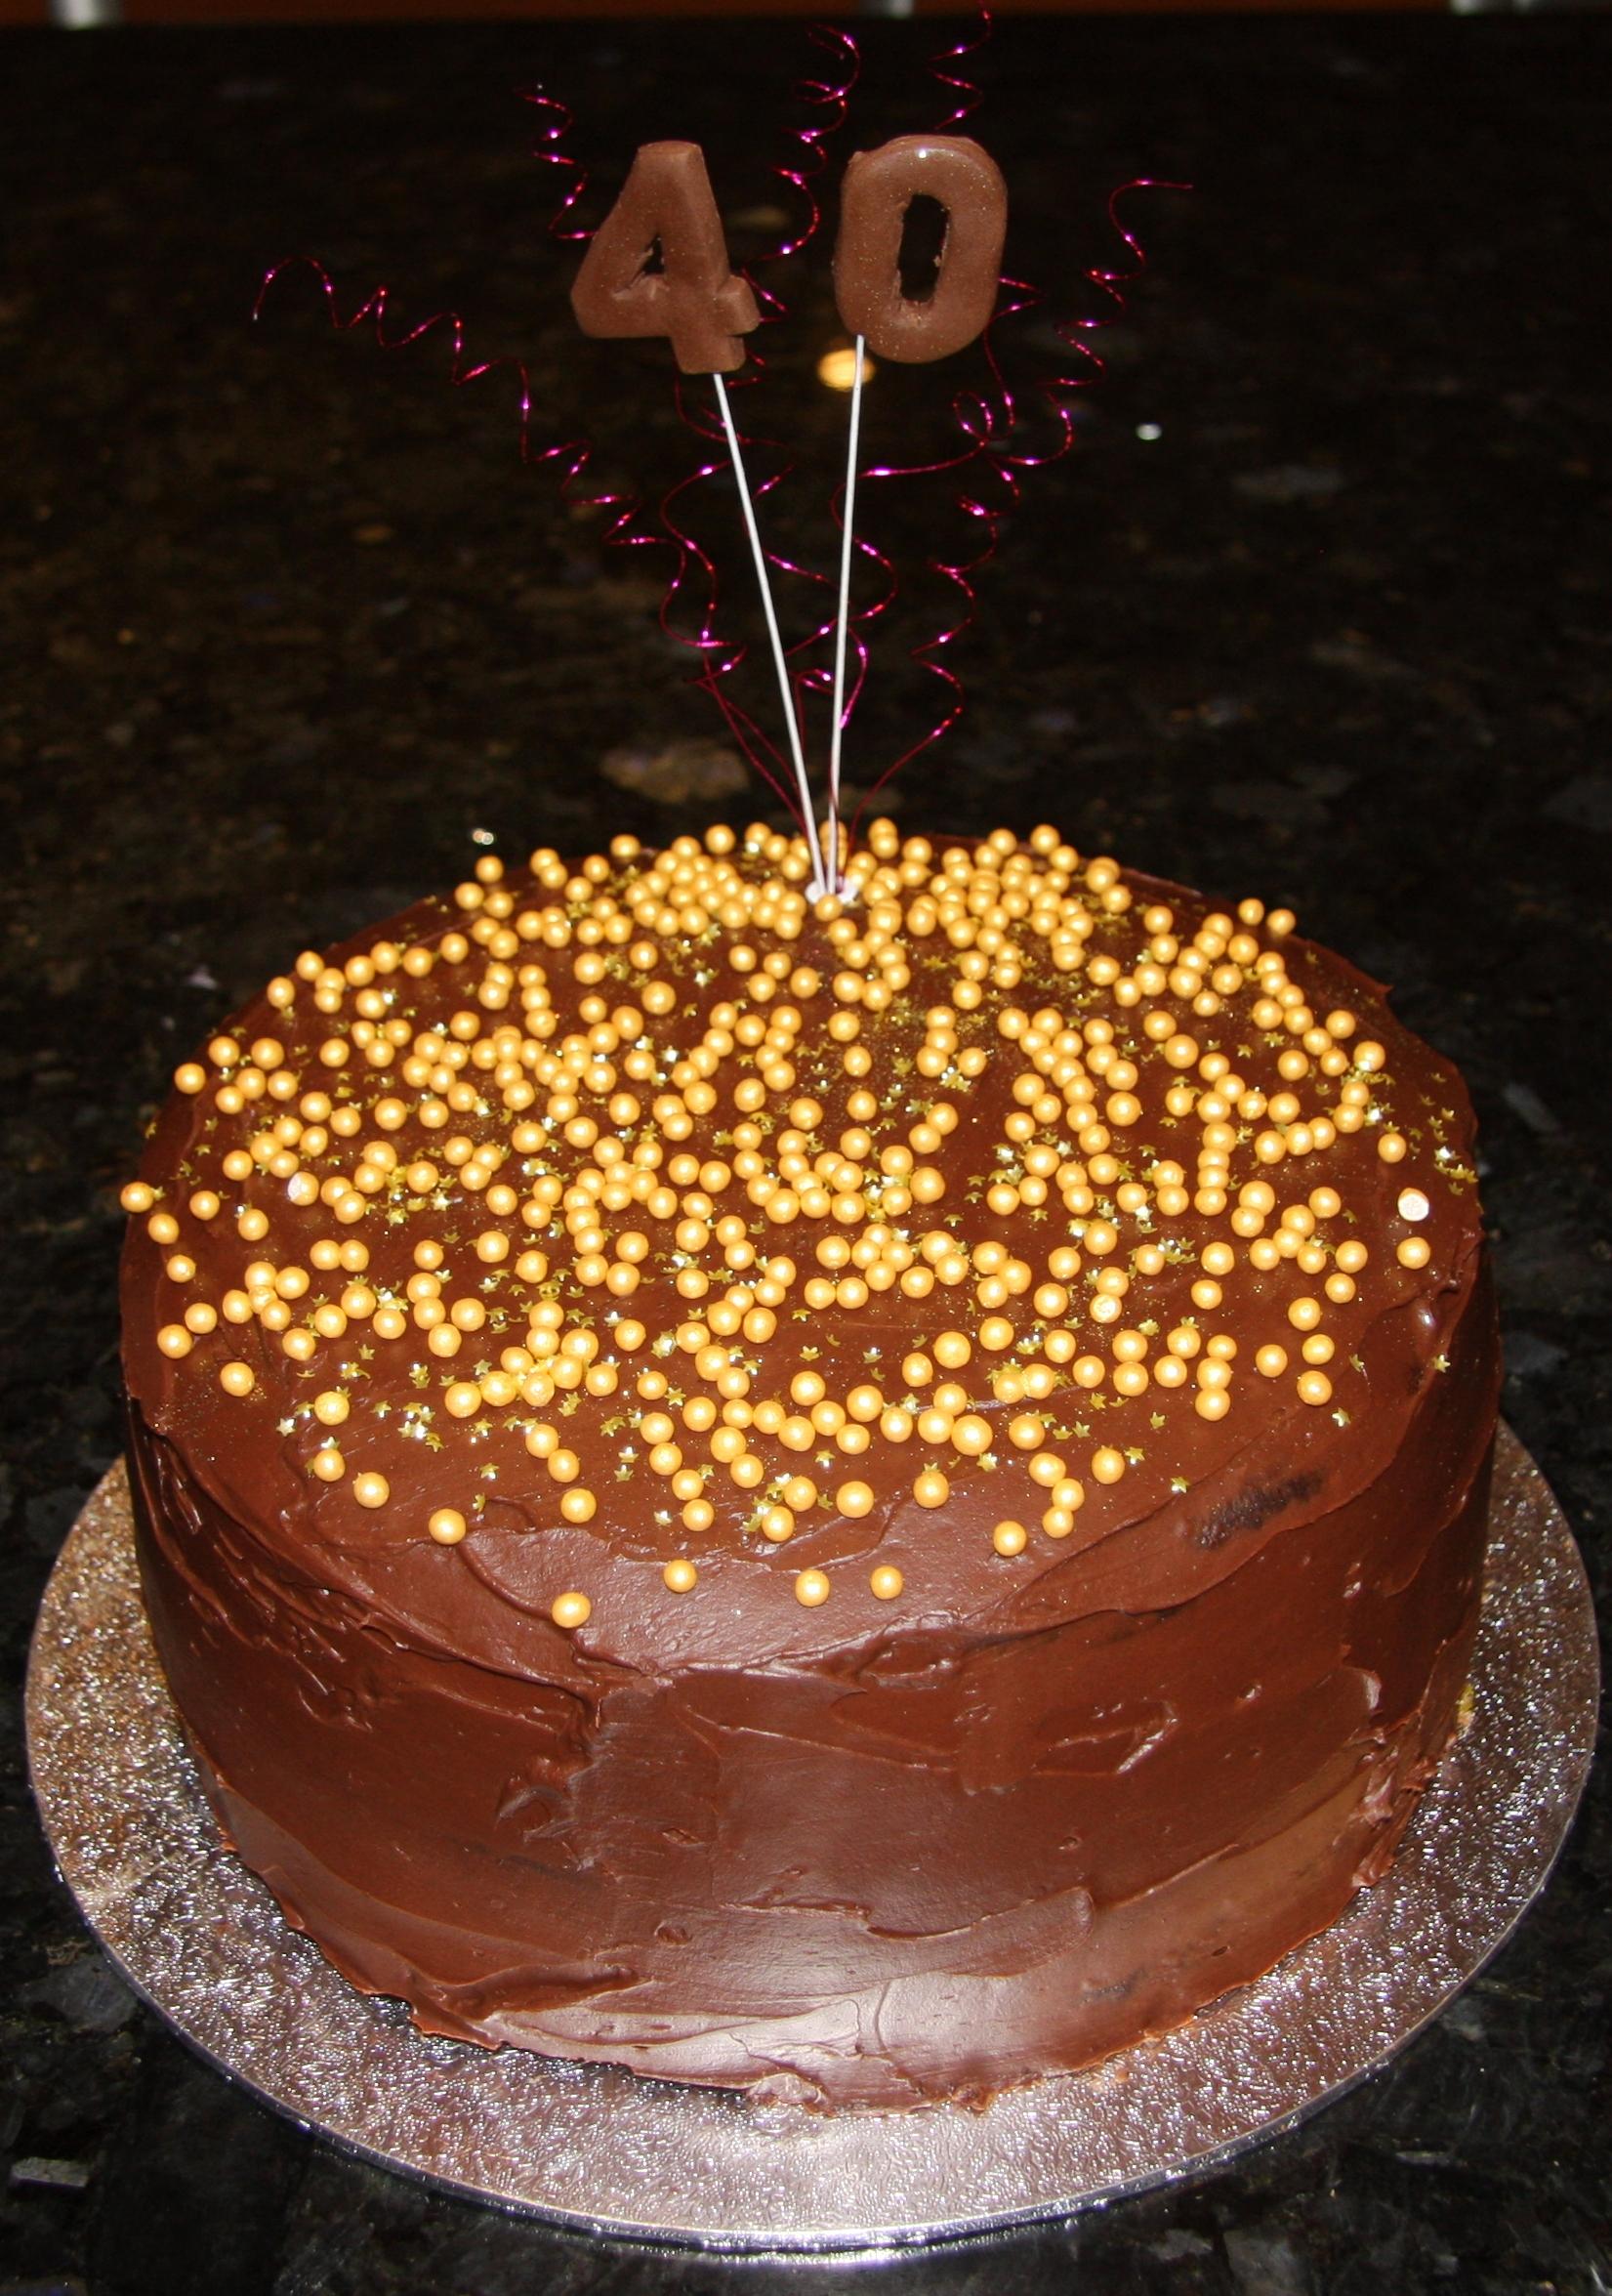 Soured Cream Birthday Cake